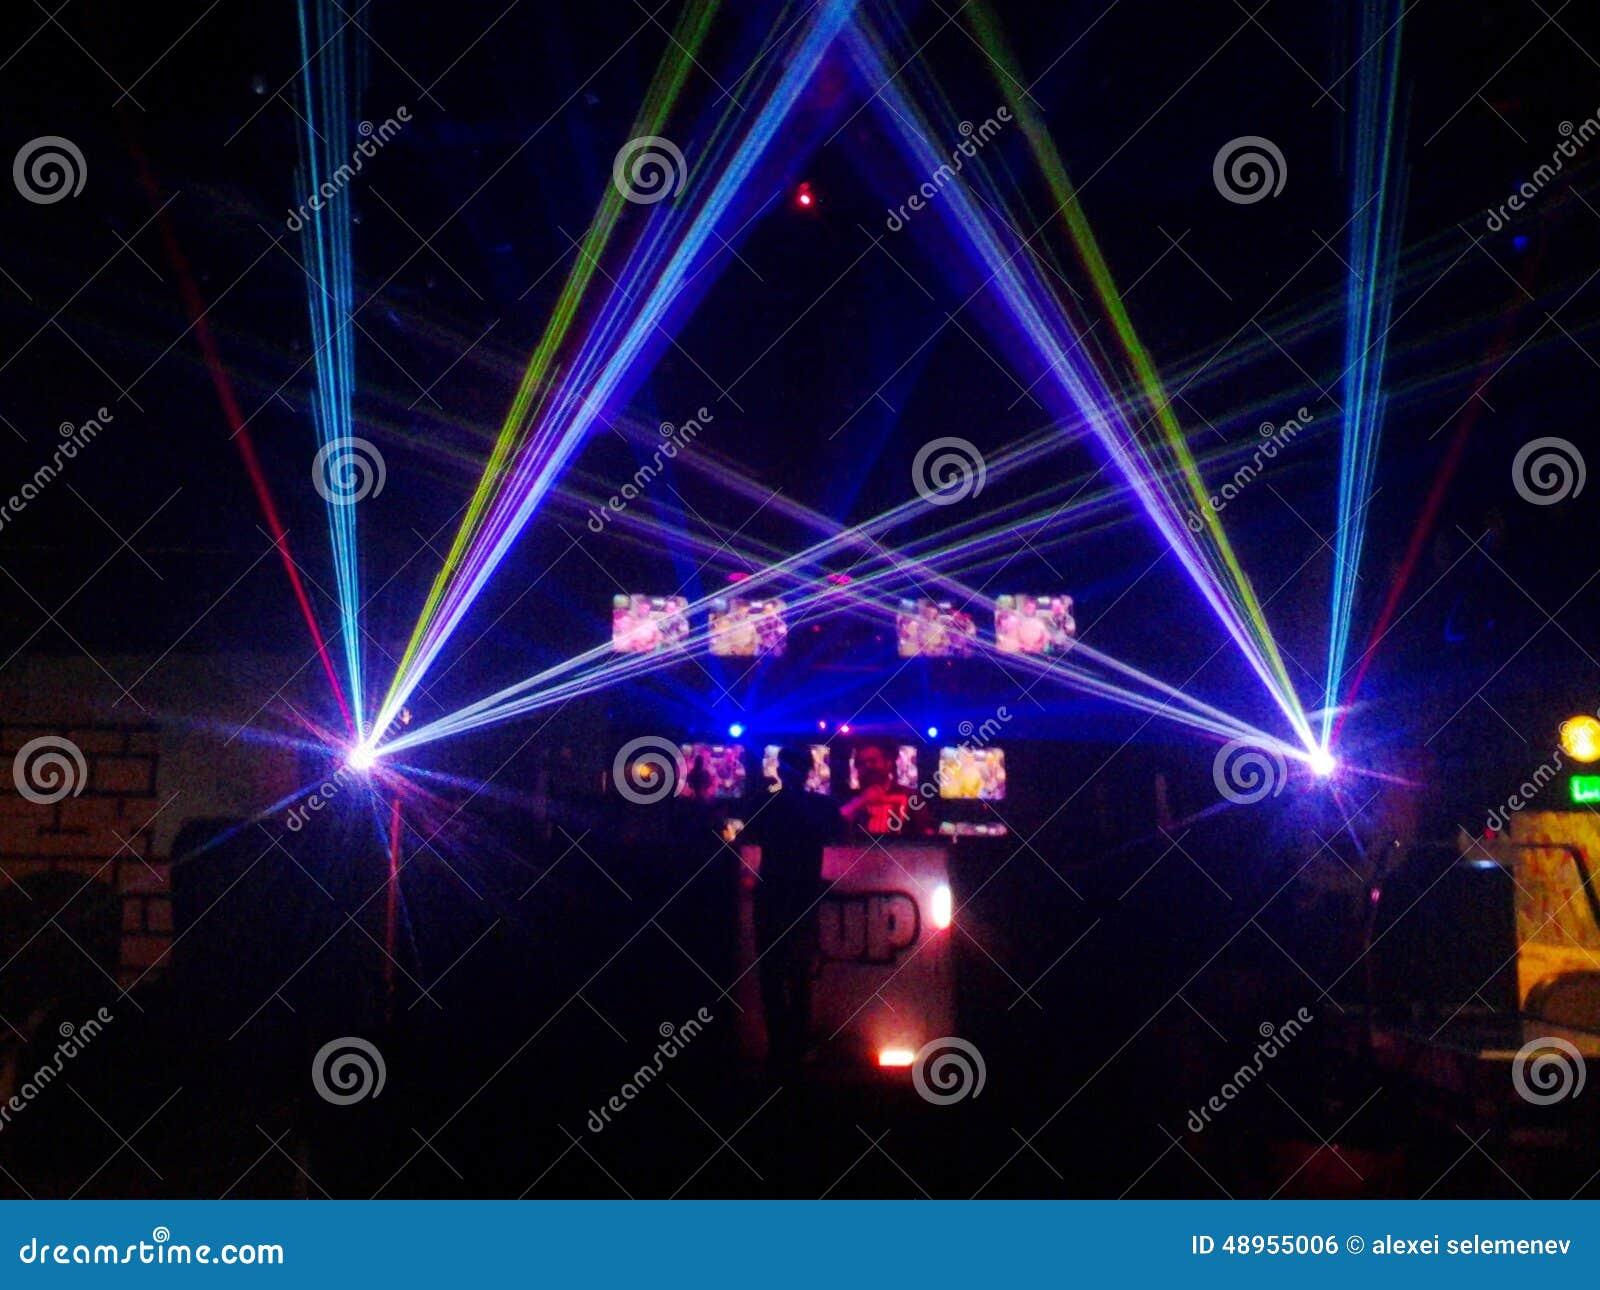 laser lights club - photo #36